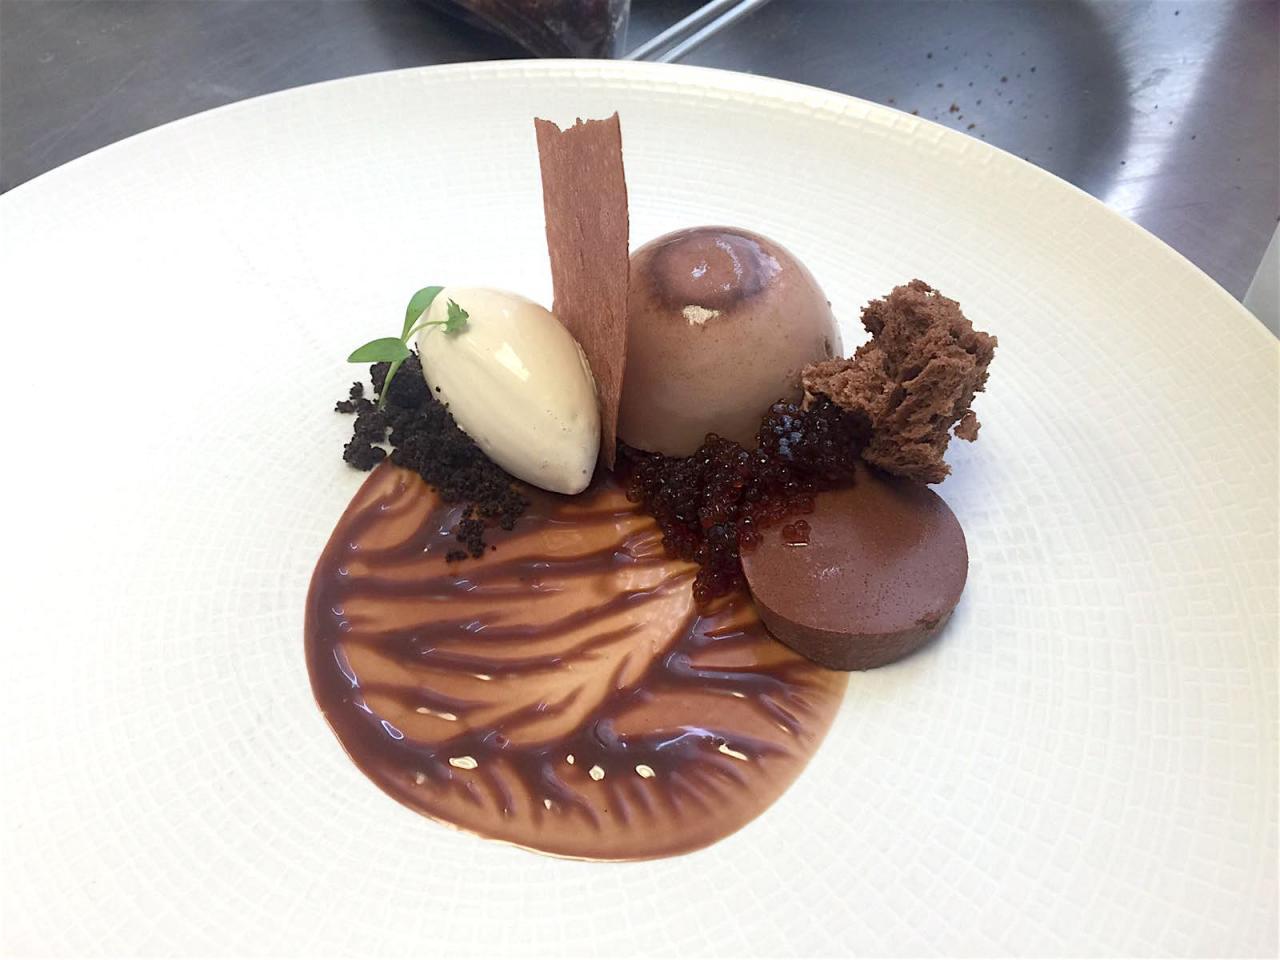 The chocolate panna cotta. Photo: Courtesy of Ryan Thompson